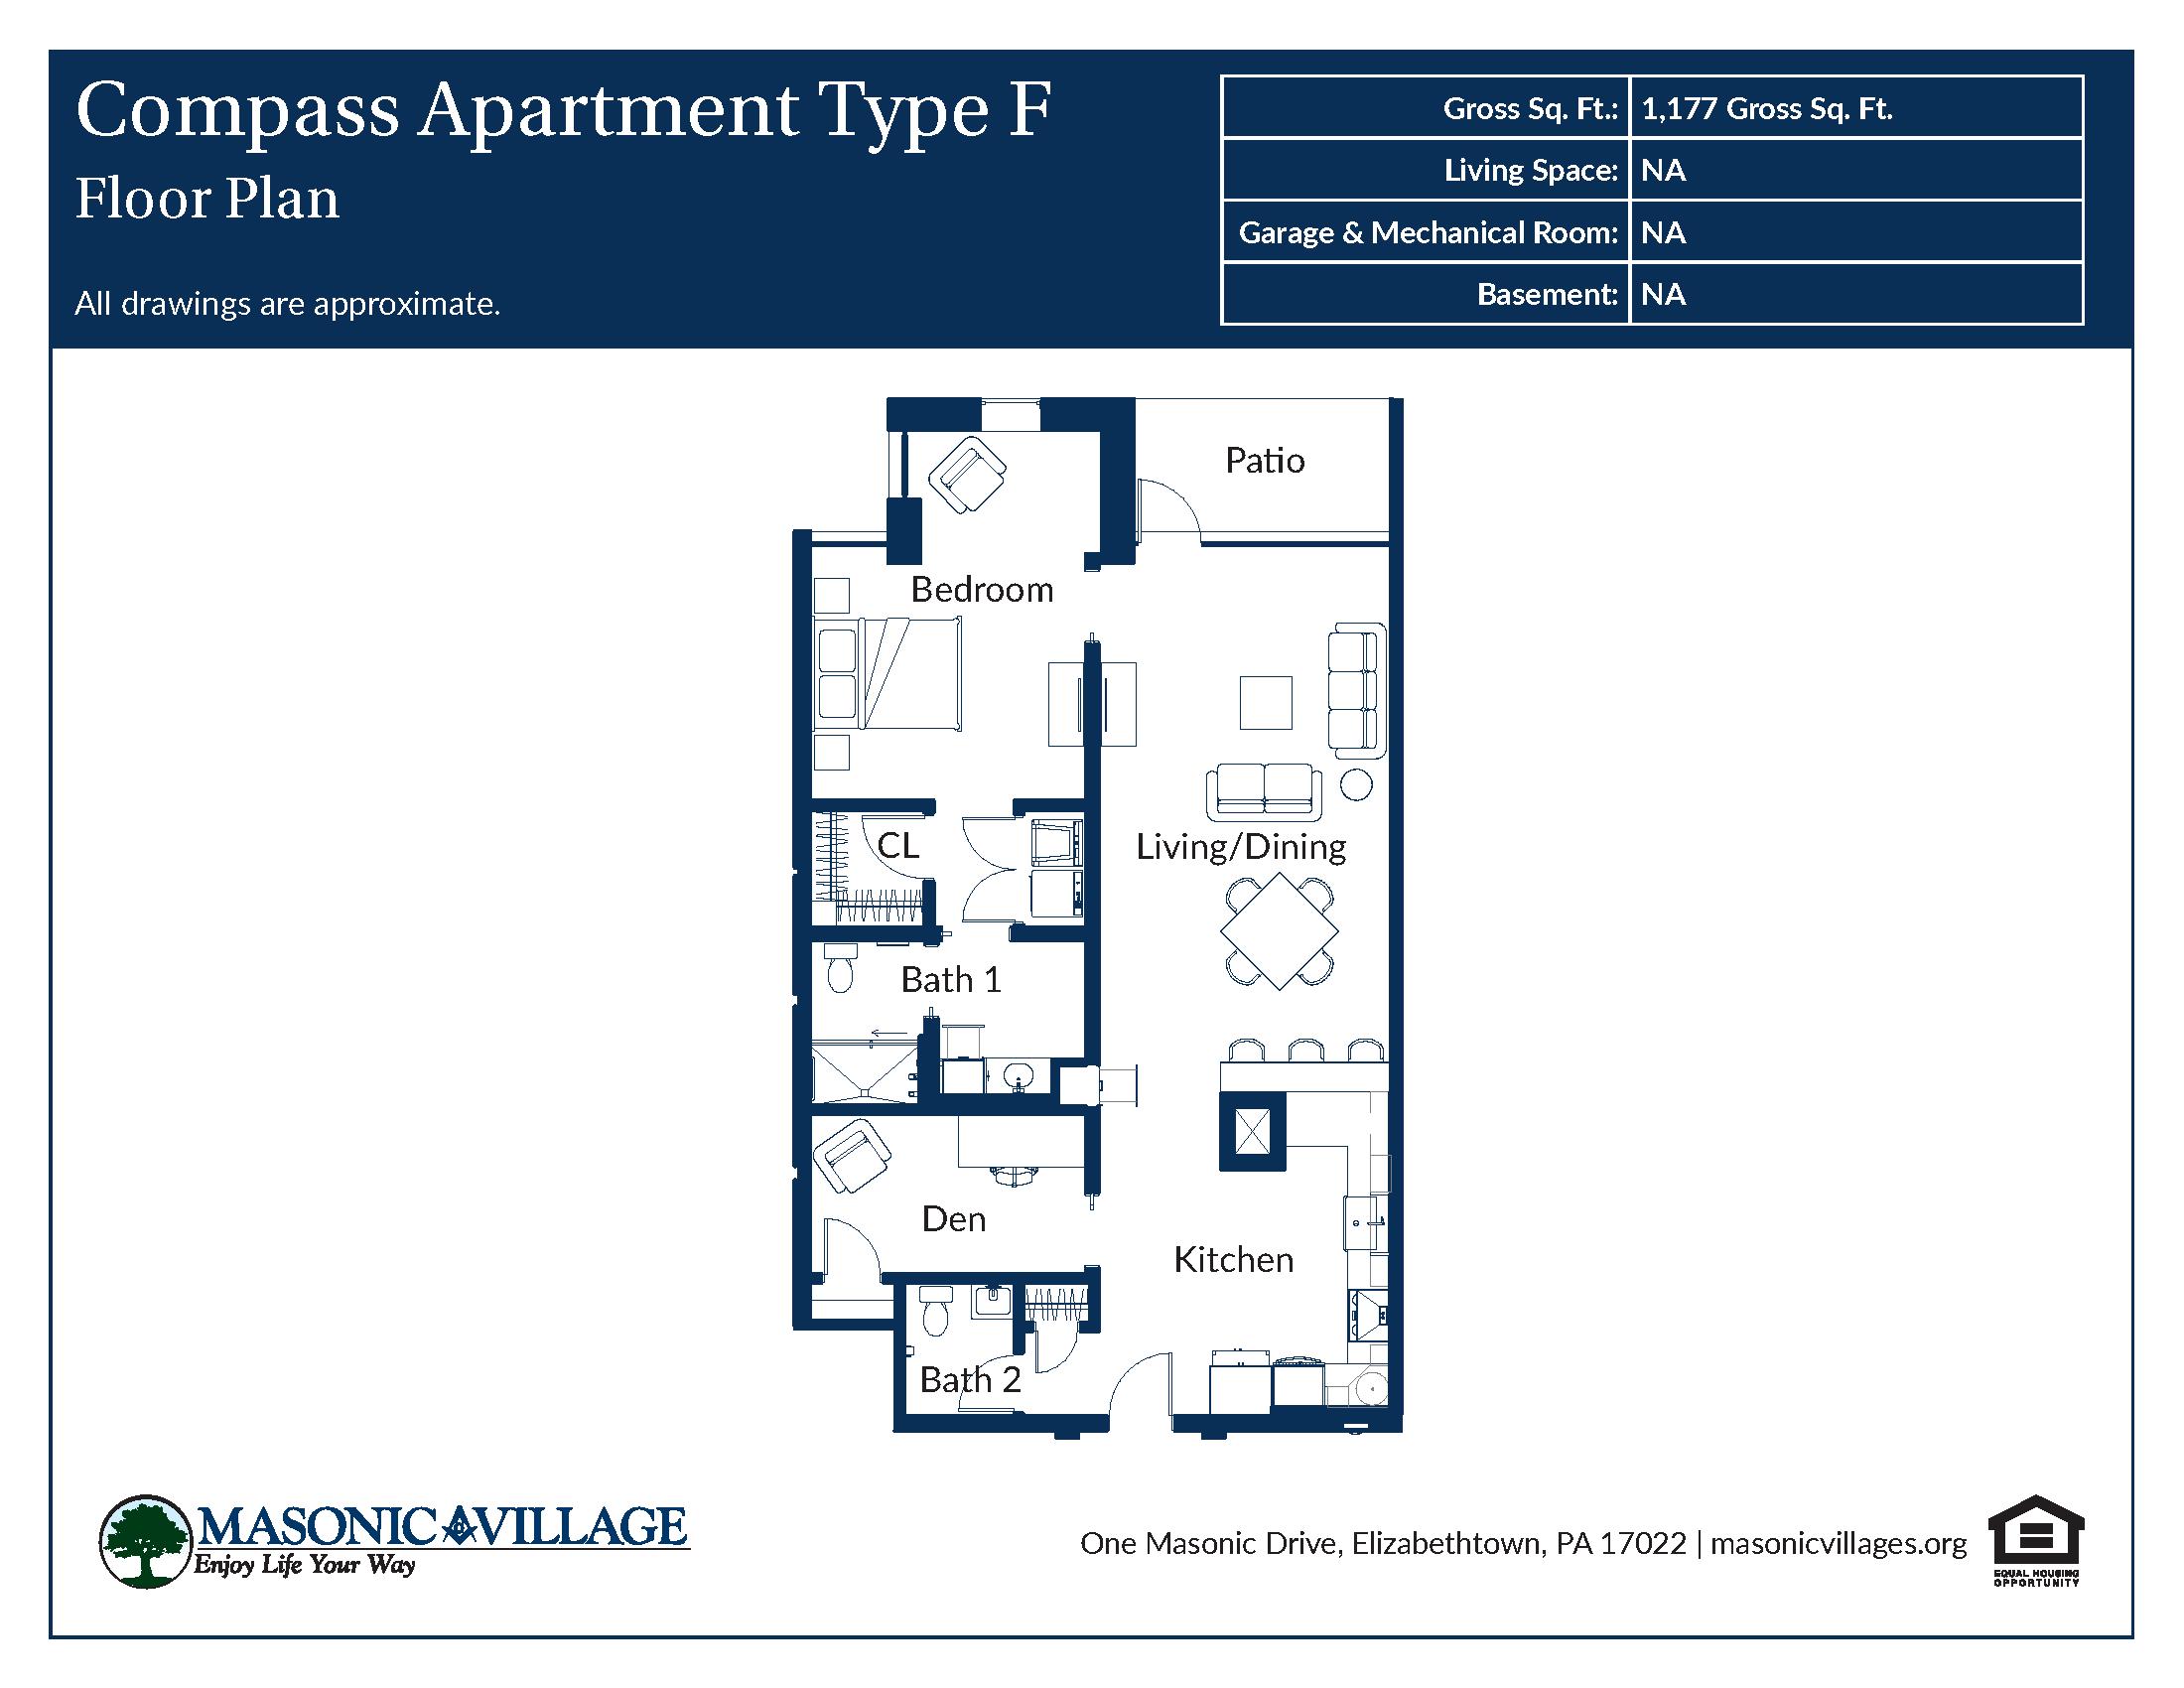 Masonic Village at Elizabethtown - Compass Apartment F Floor Plan